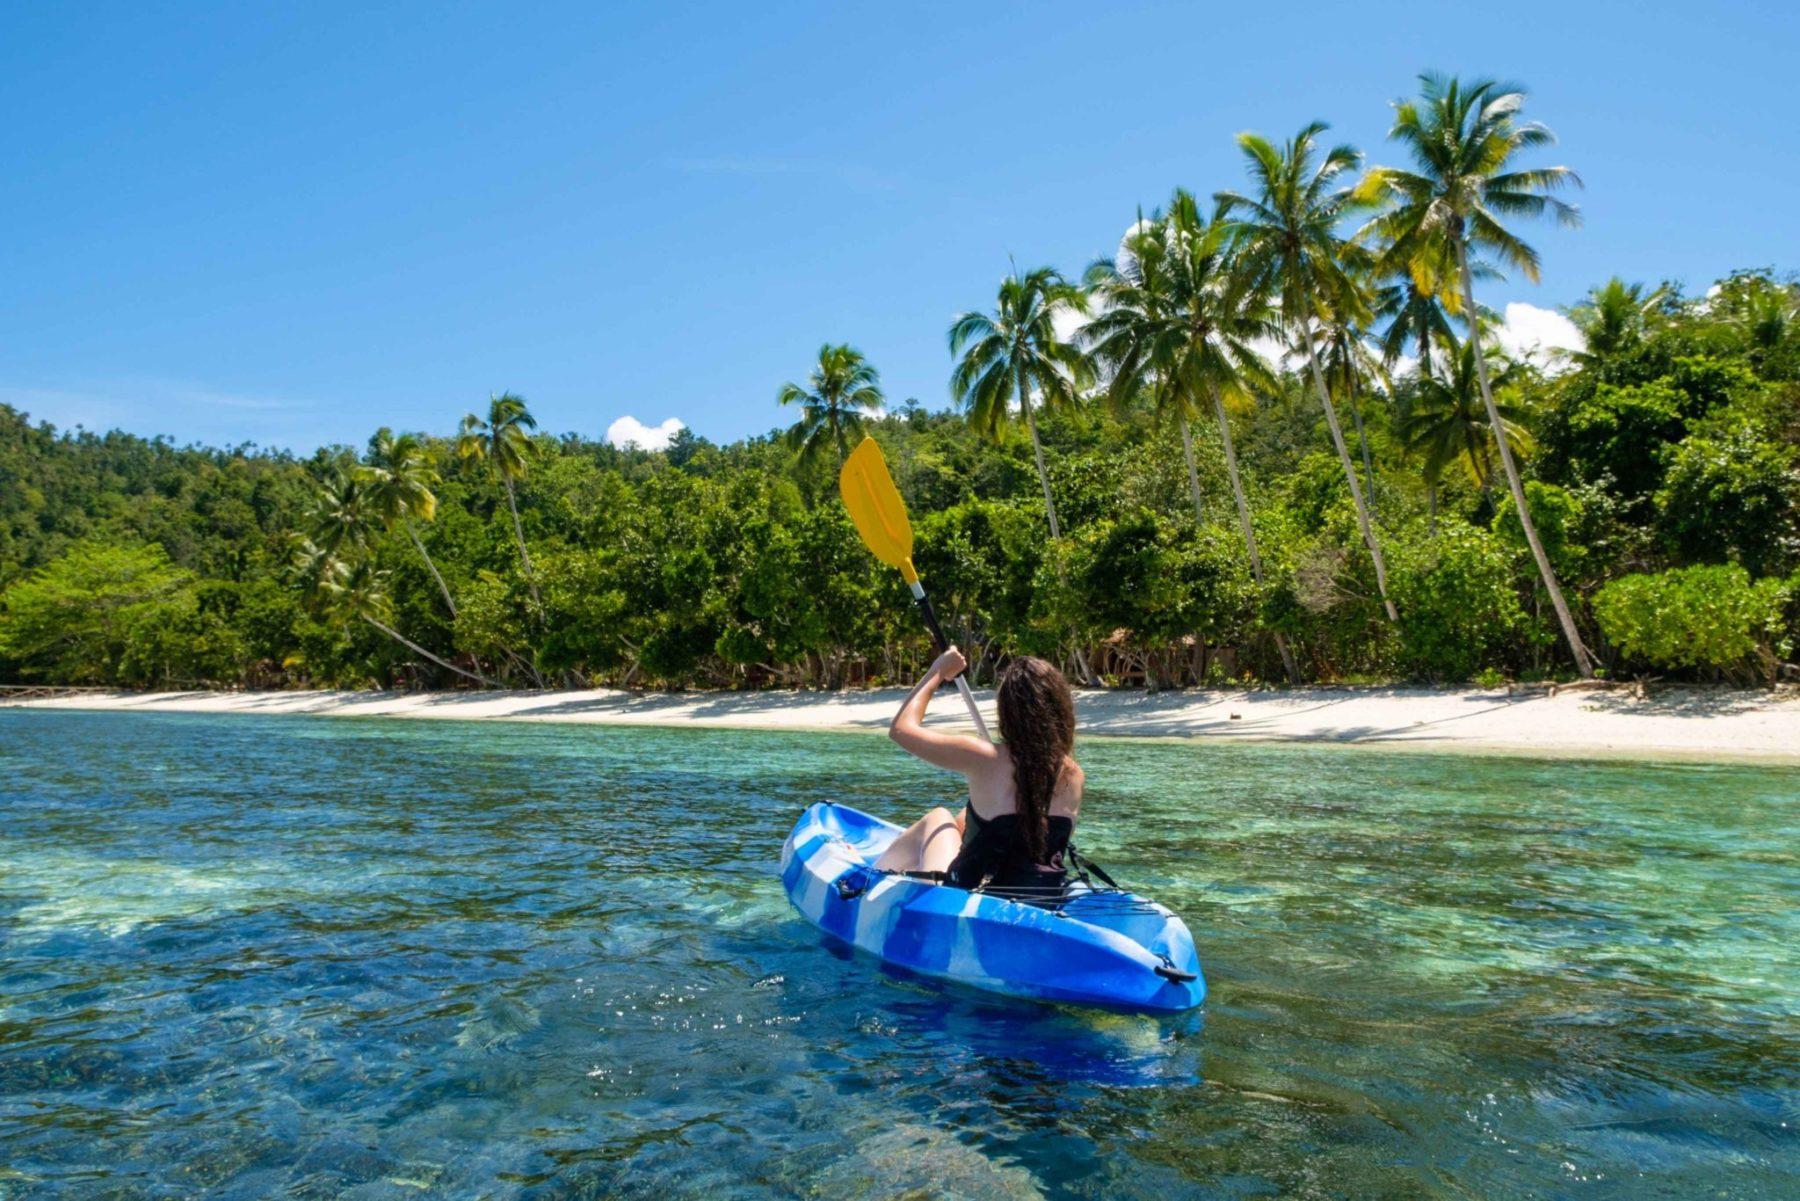 raja ampat activities - Kayaks